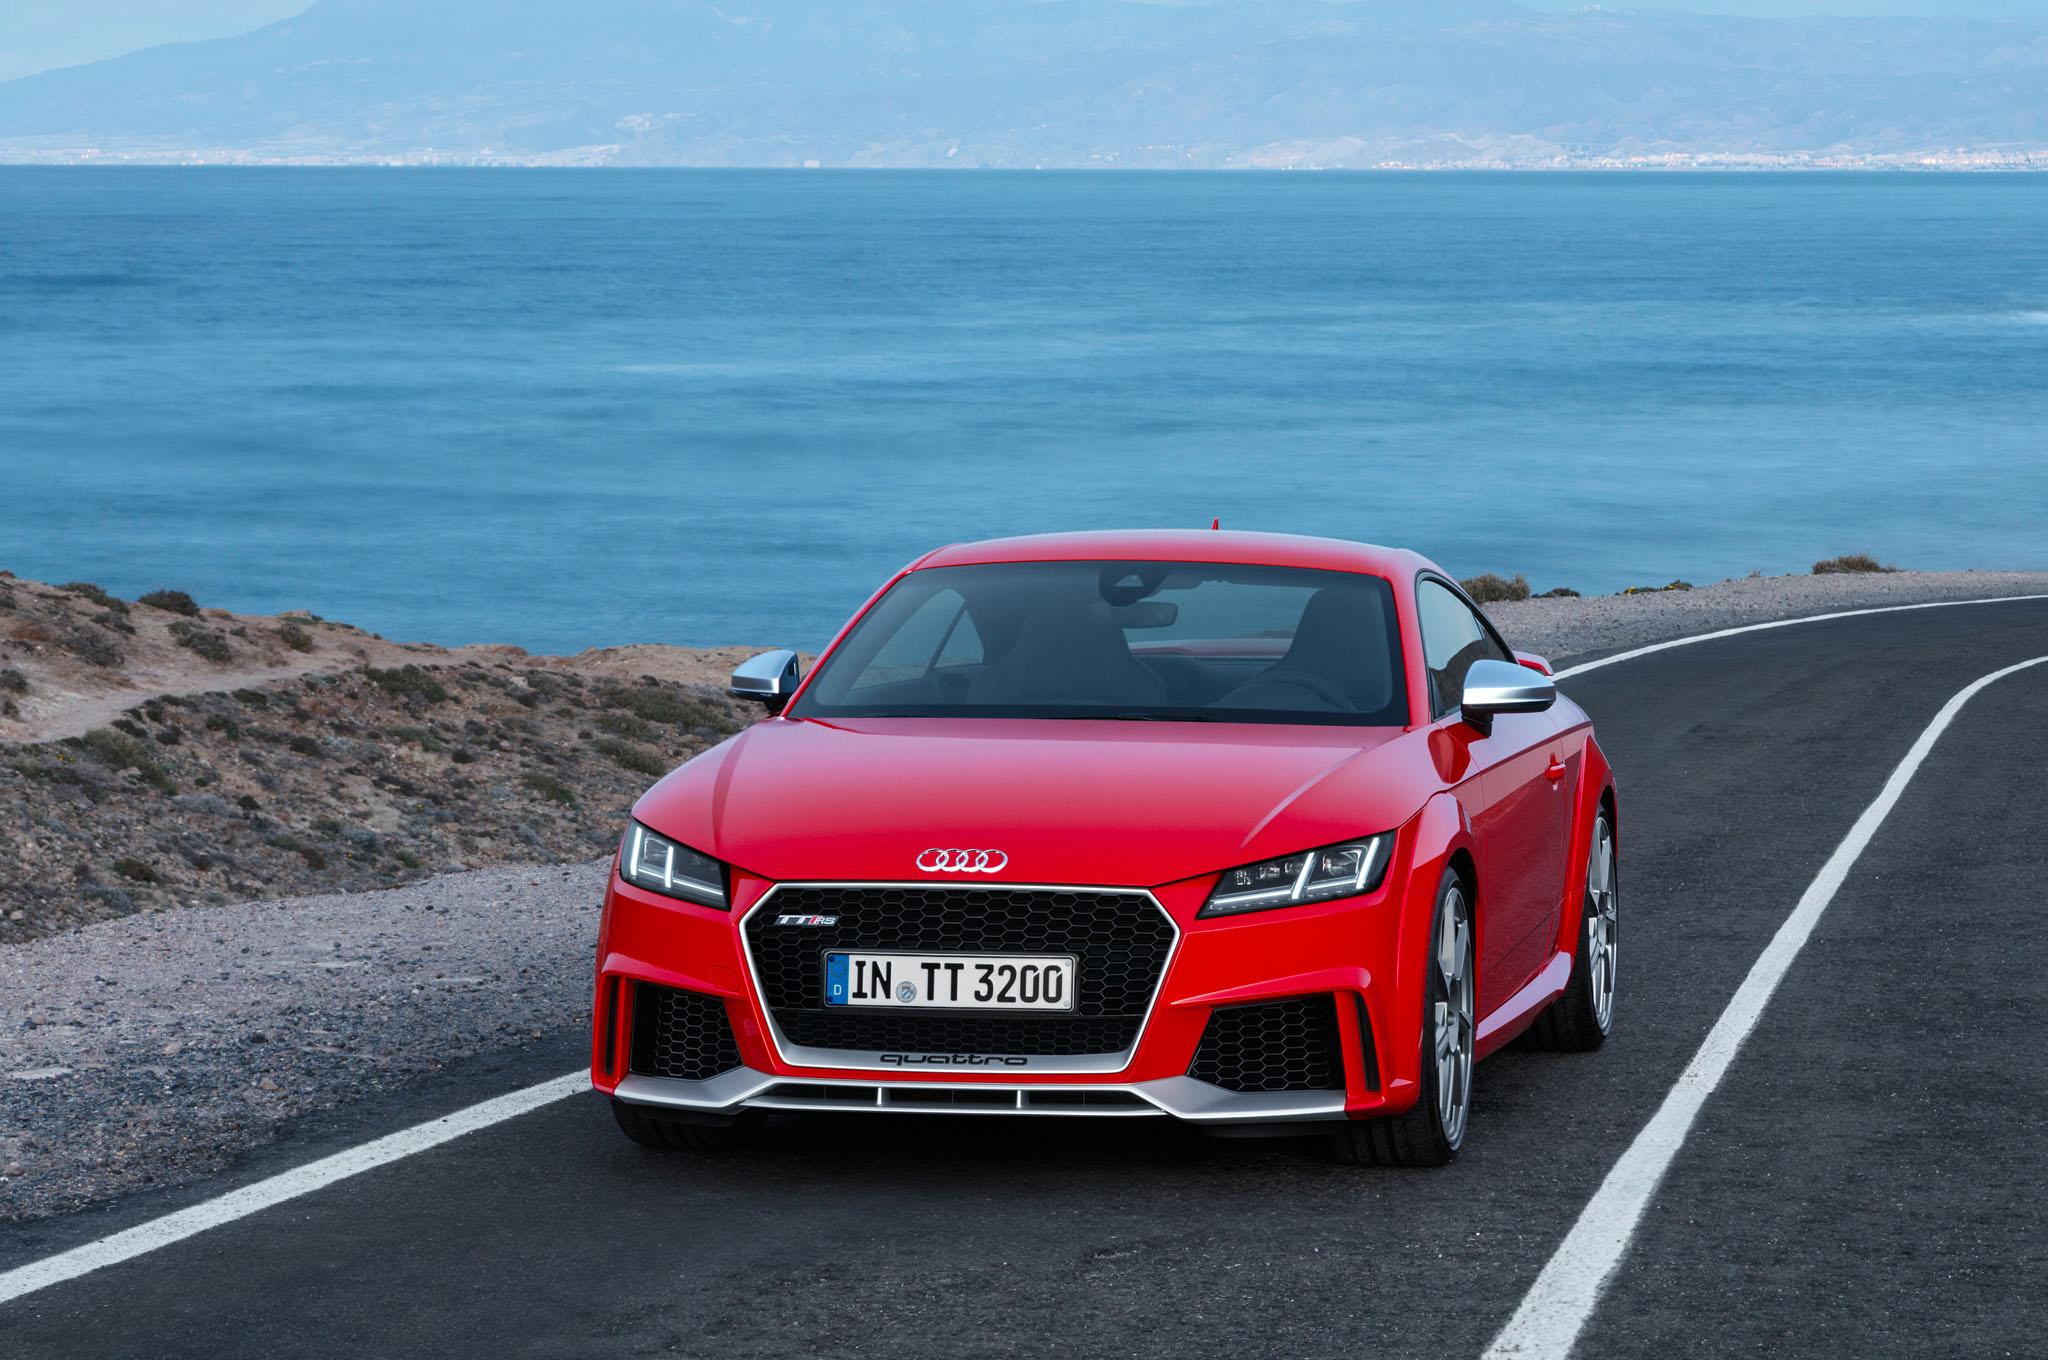 2017 Audi TT RS Coupe High Definition Wallpaper HD Car 2048x1360